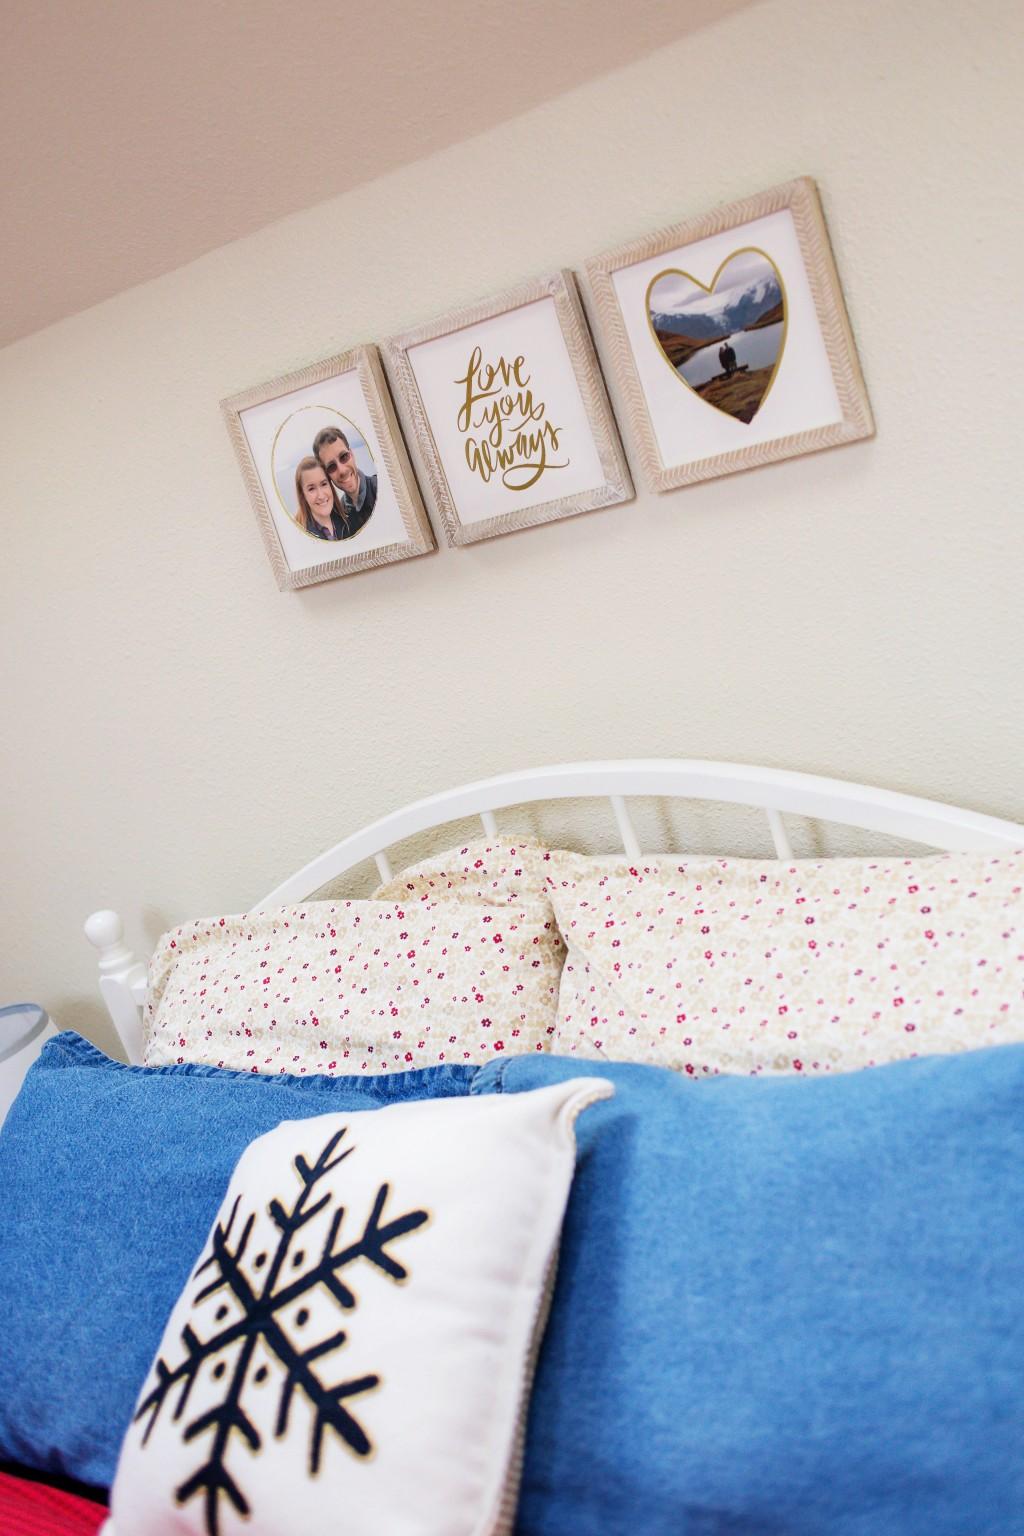 Bedroom Artwork from Minted.com